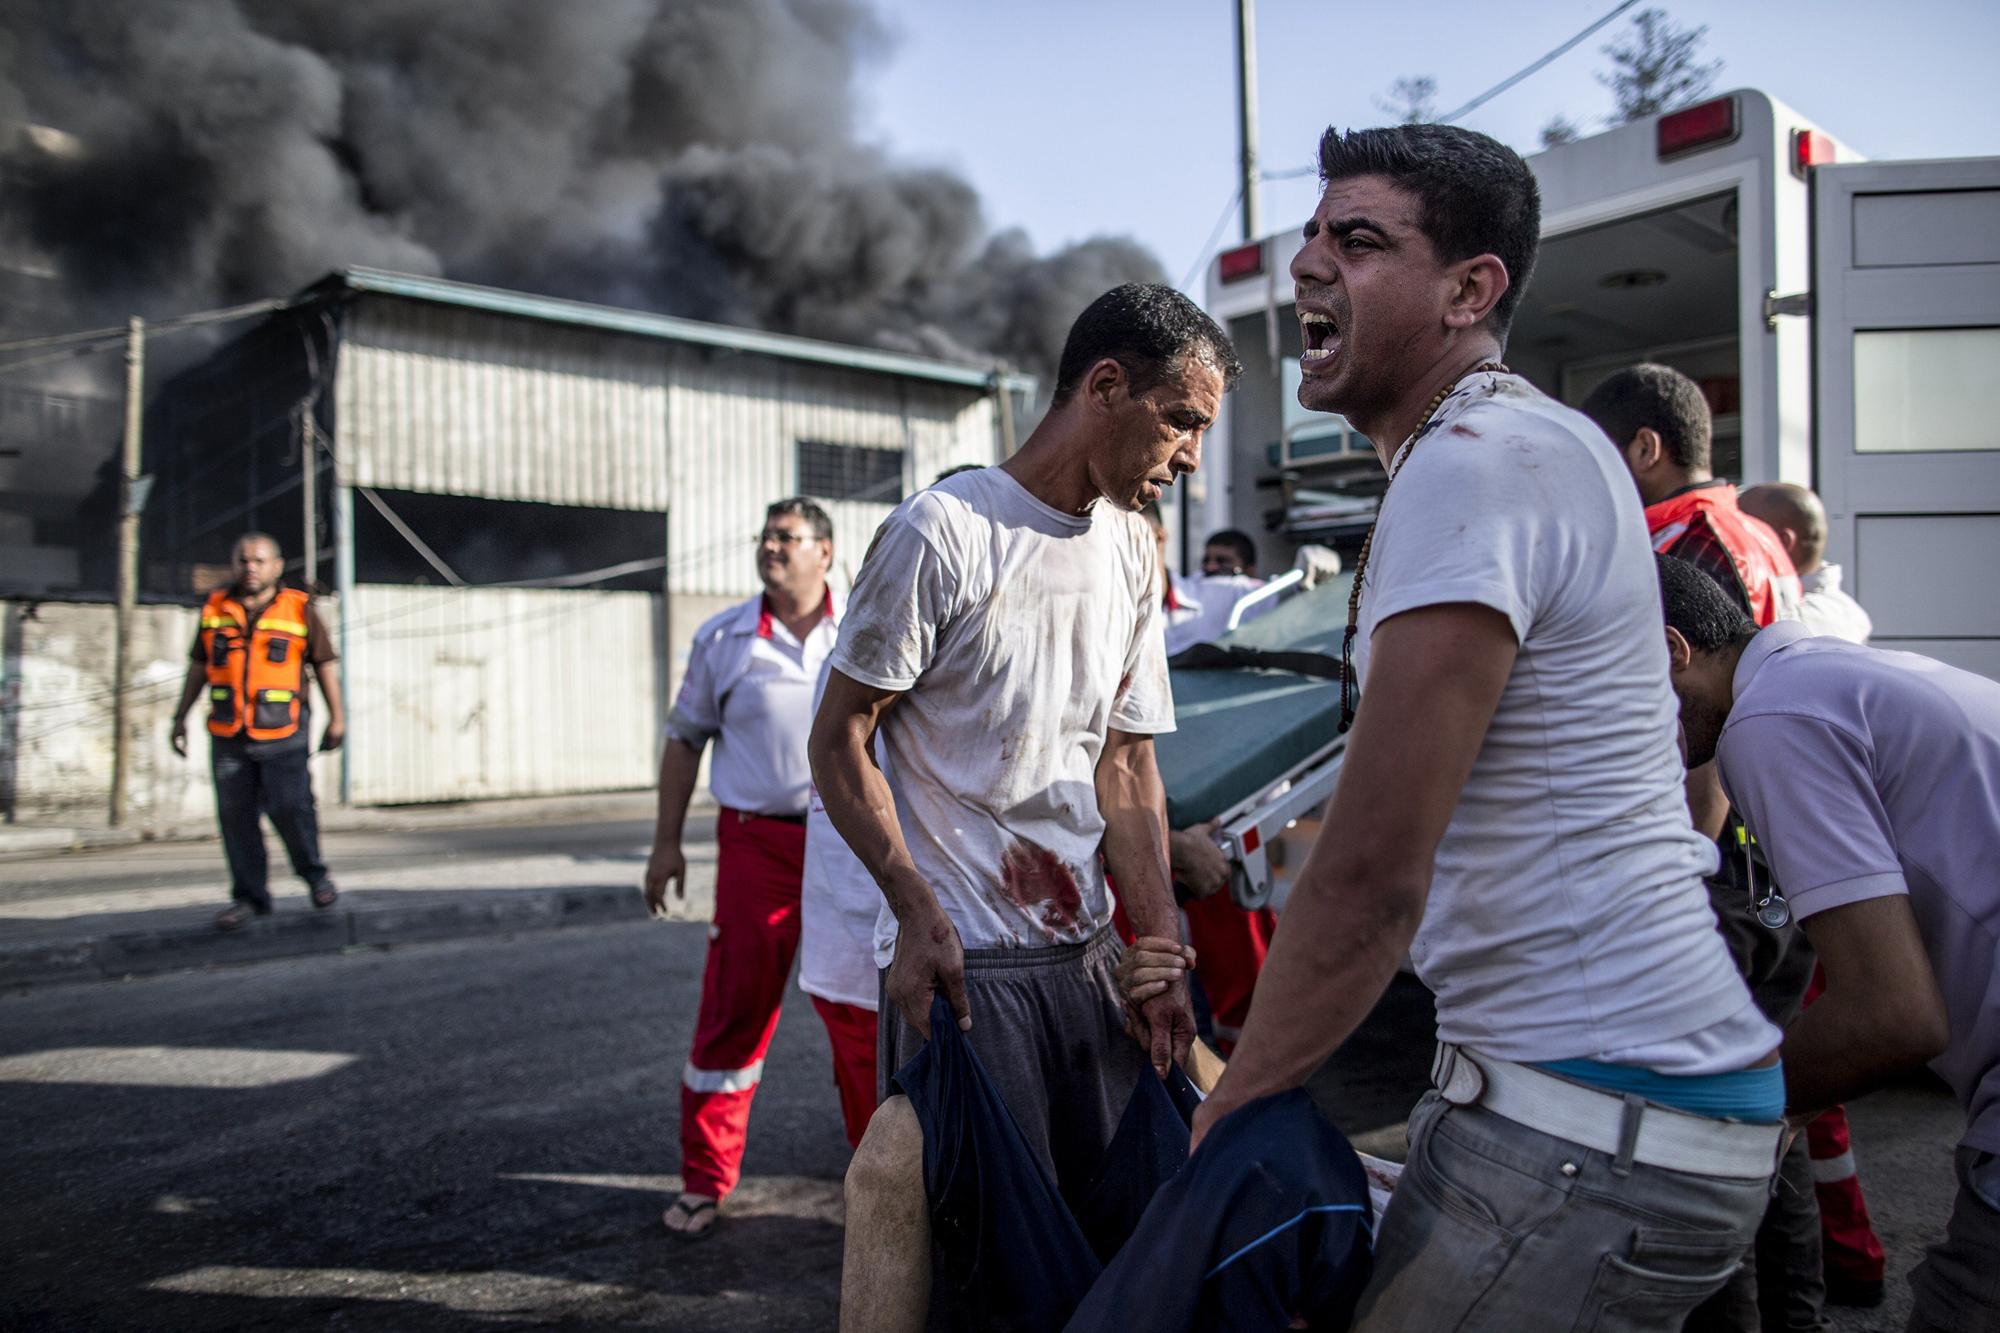 Palestinian emergency personnel and civilians evacuate victims of an Israeli air strike on a market place in the Shejaiya neighborhood near Gaza City, on July 30, 2014.